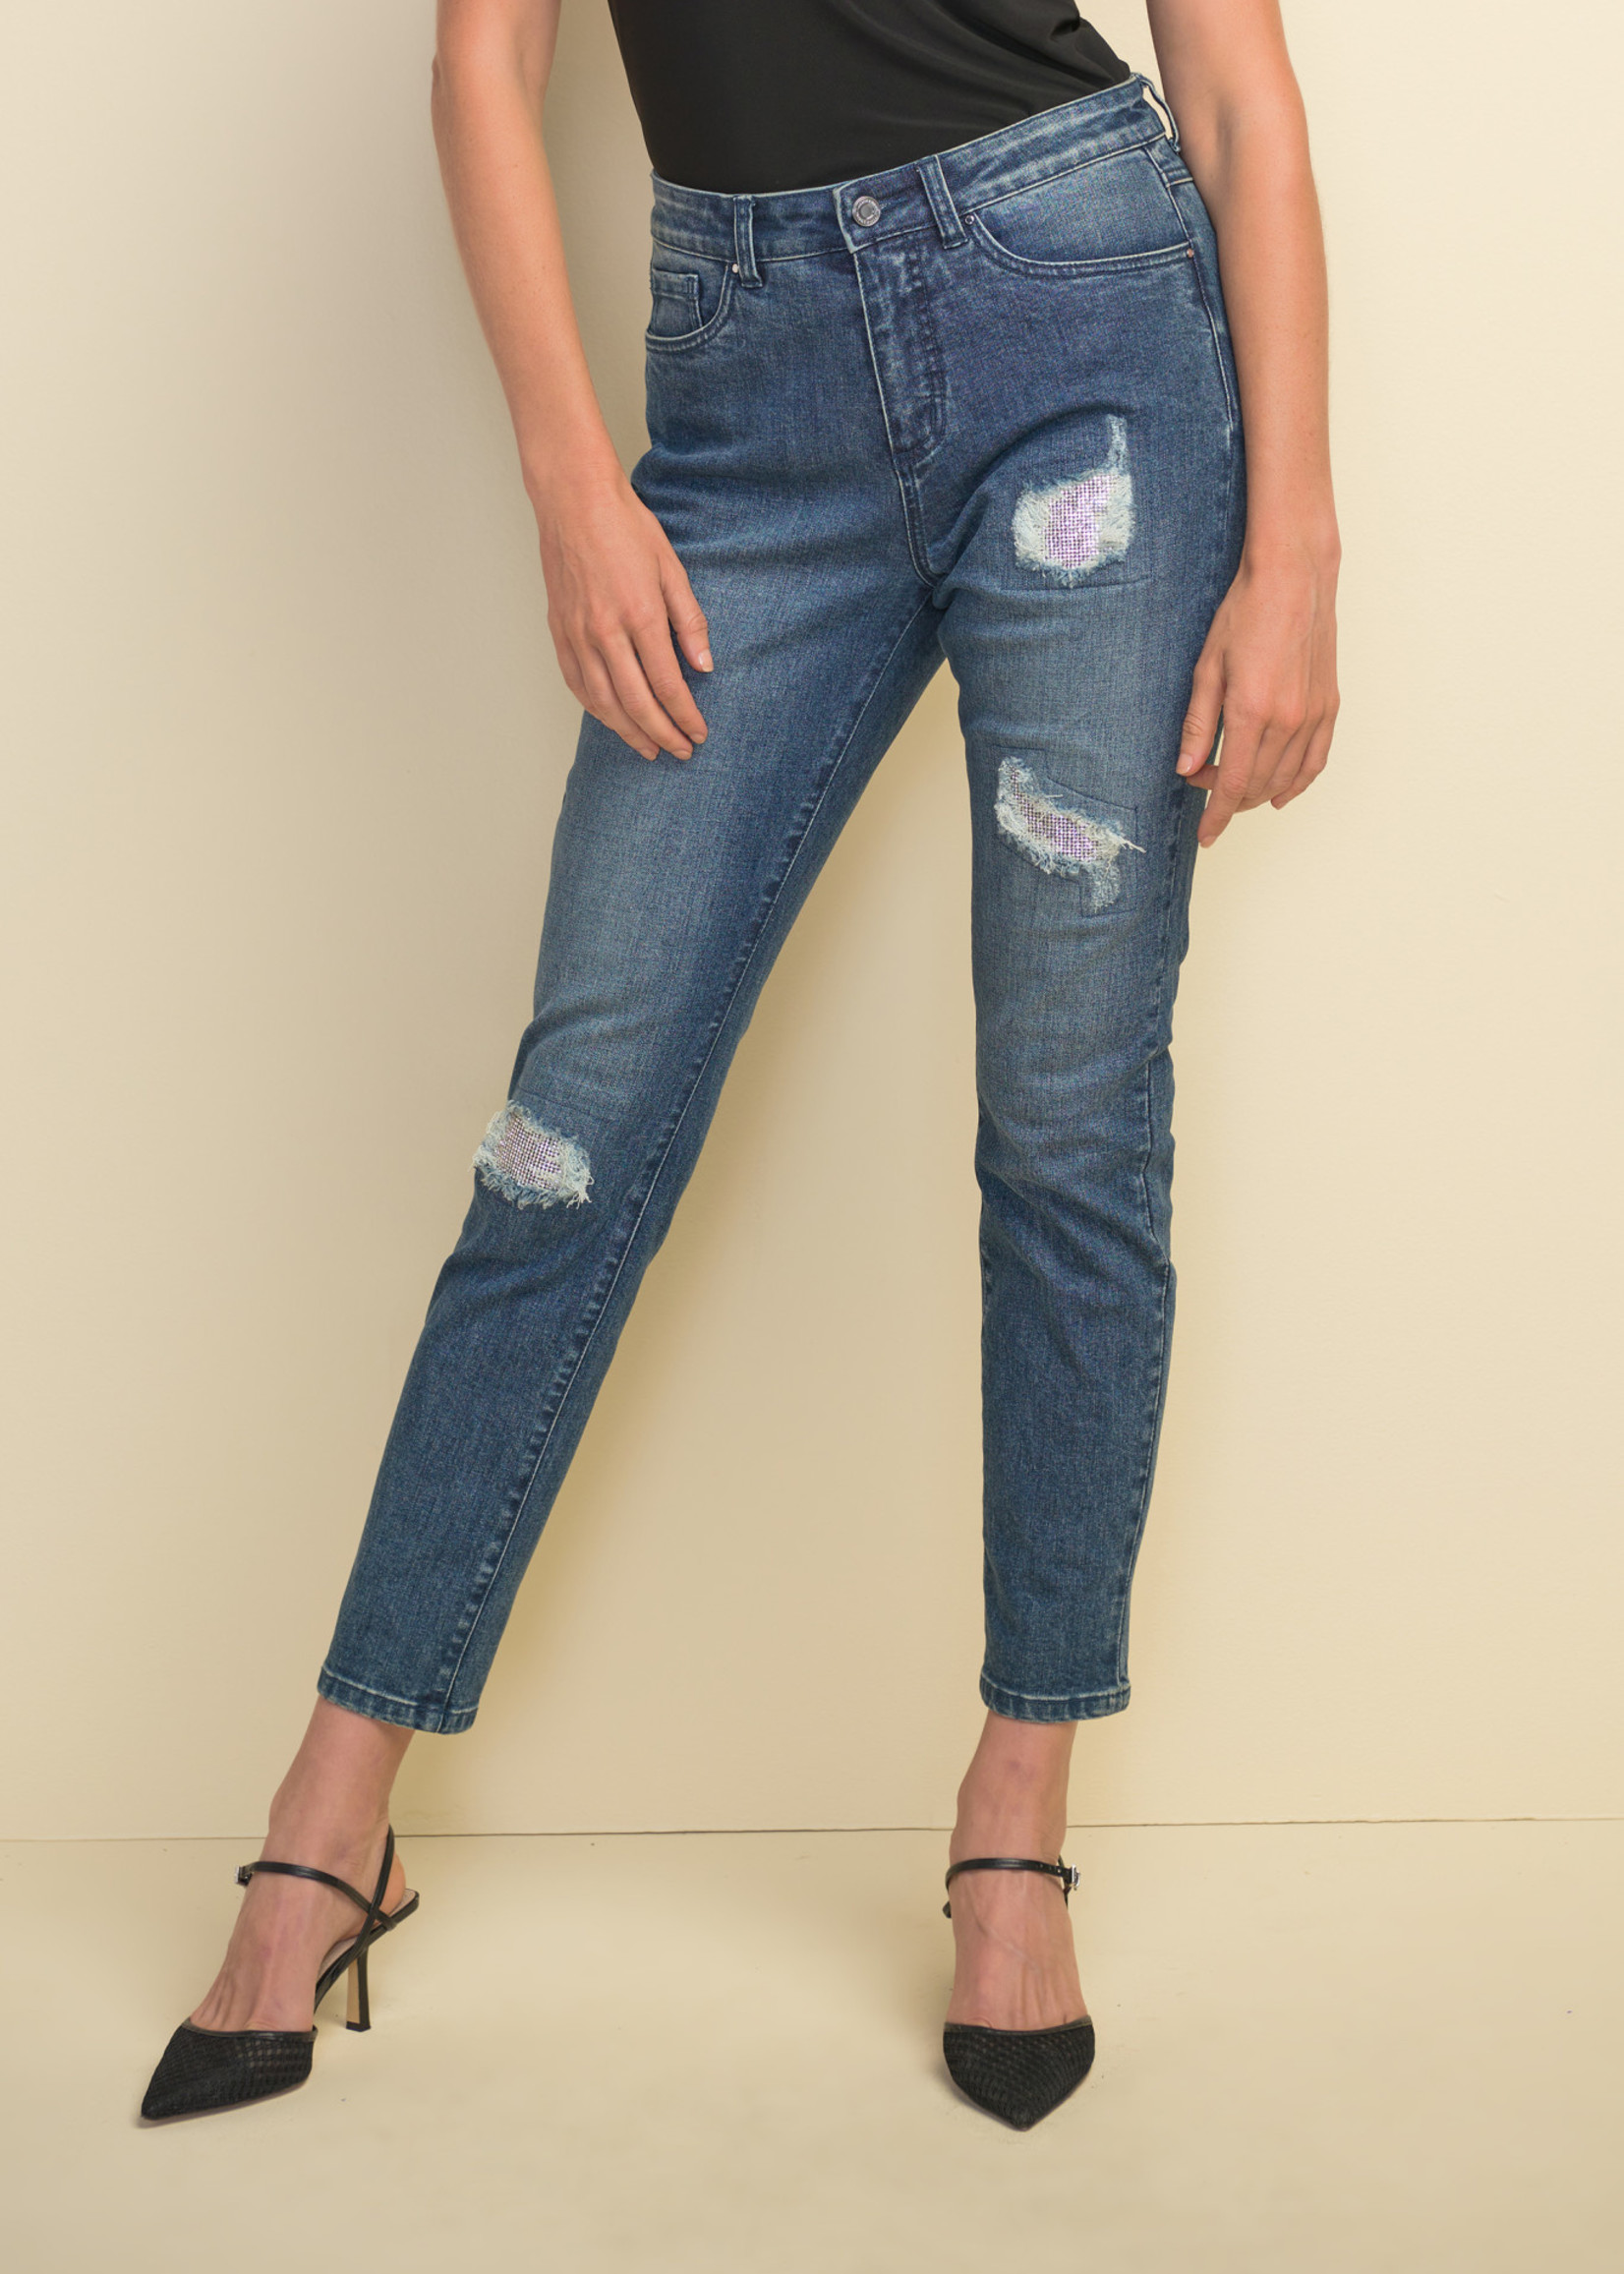 Joseph Ribkoff Joseph Ribkoff Jeans with Glitter Patch